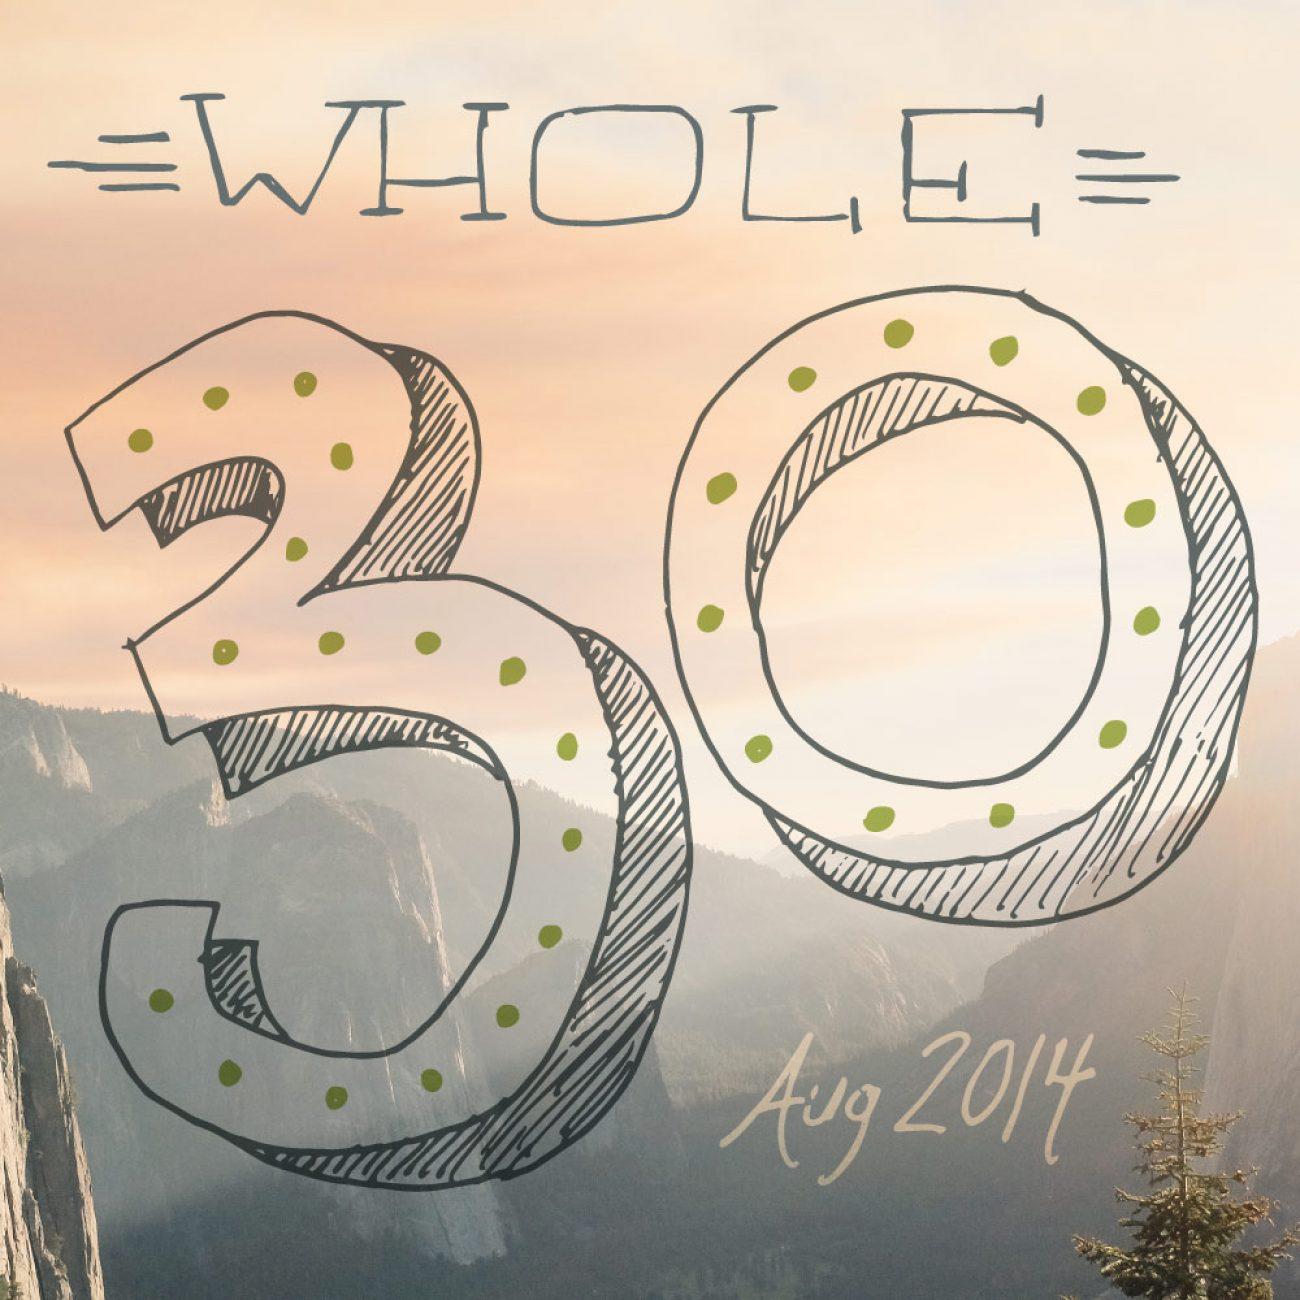 Whole 30 Aug 2014